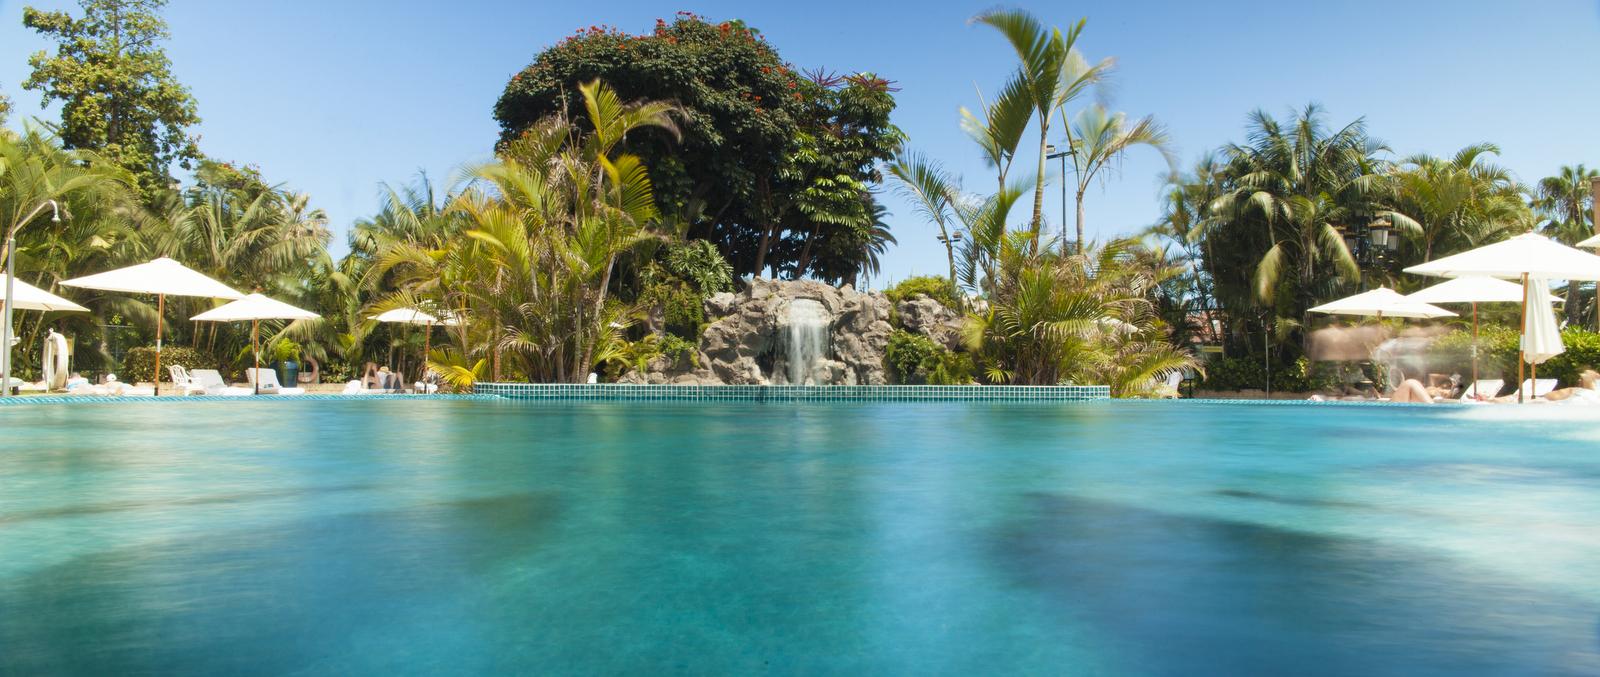 hotel-botanico-tenerife-pool